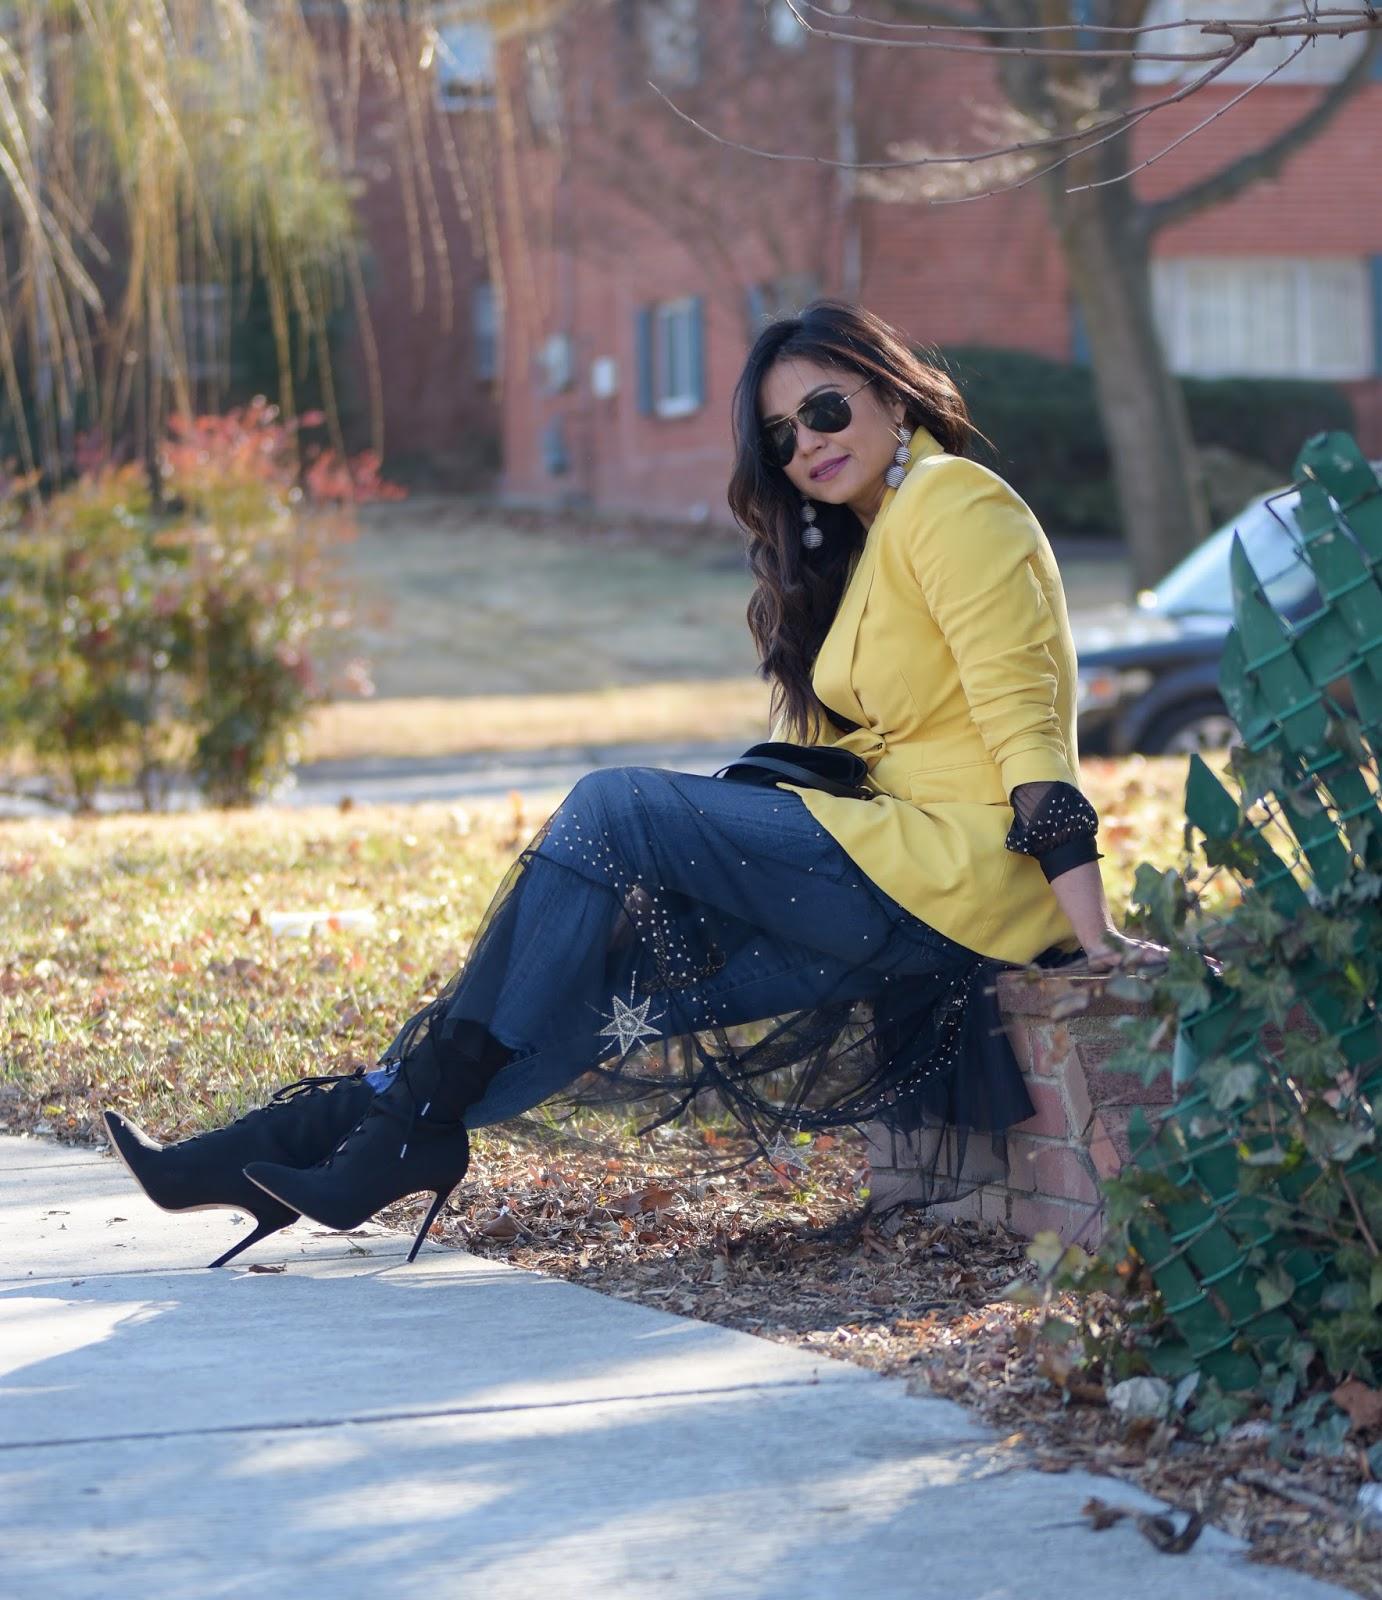 how to wear dress over jeans, mesh dress, yellow double breasted blazer, black booties, street chic, street style, black HM dress, zara blazer, ootd, myriad musings